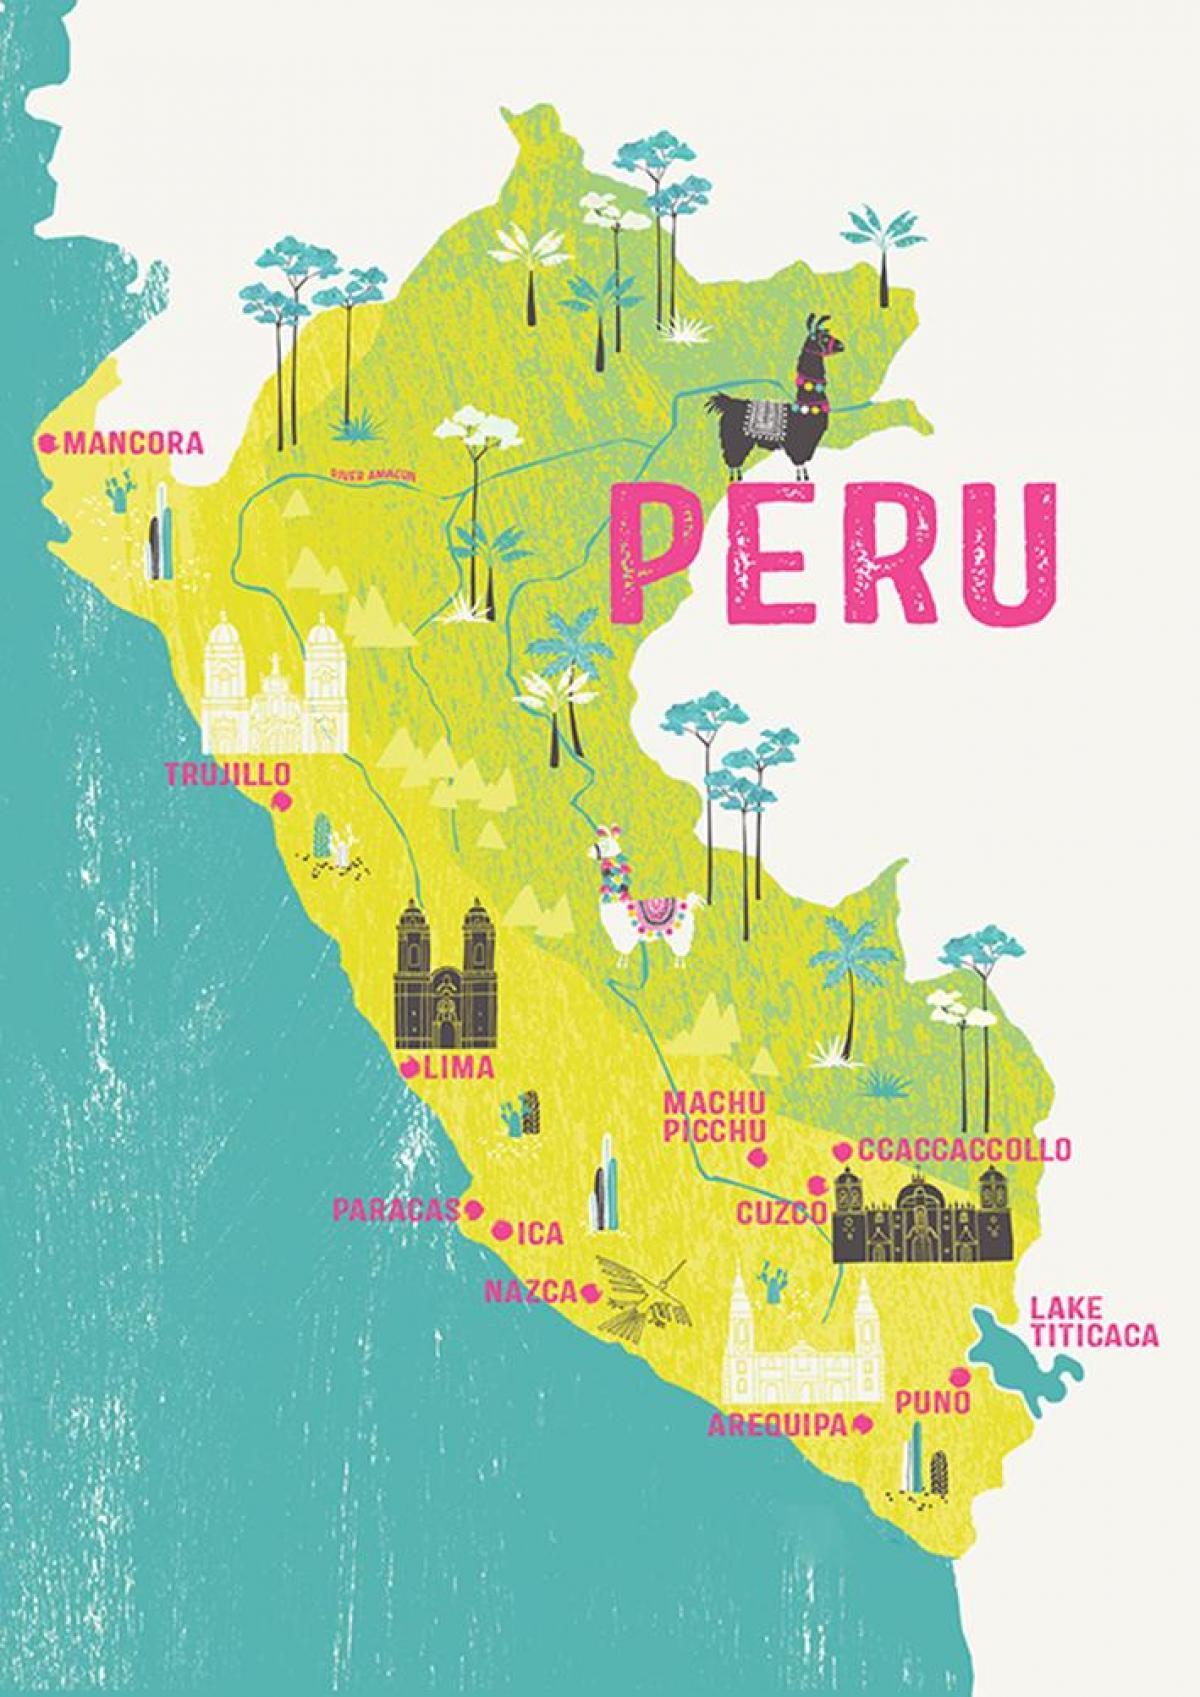 Kort Over Peru For Born Kort Over Peru For Born Syd Amerika